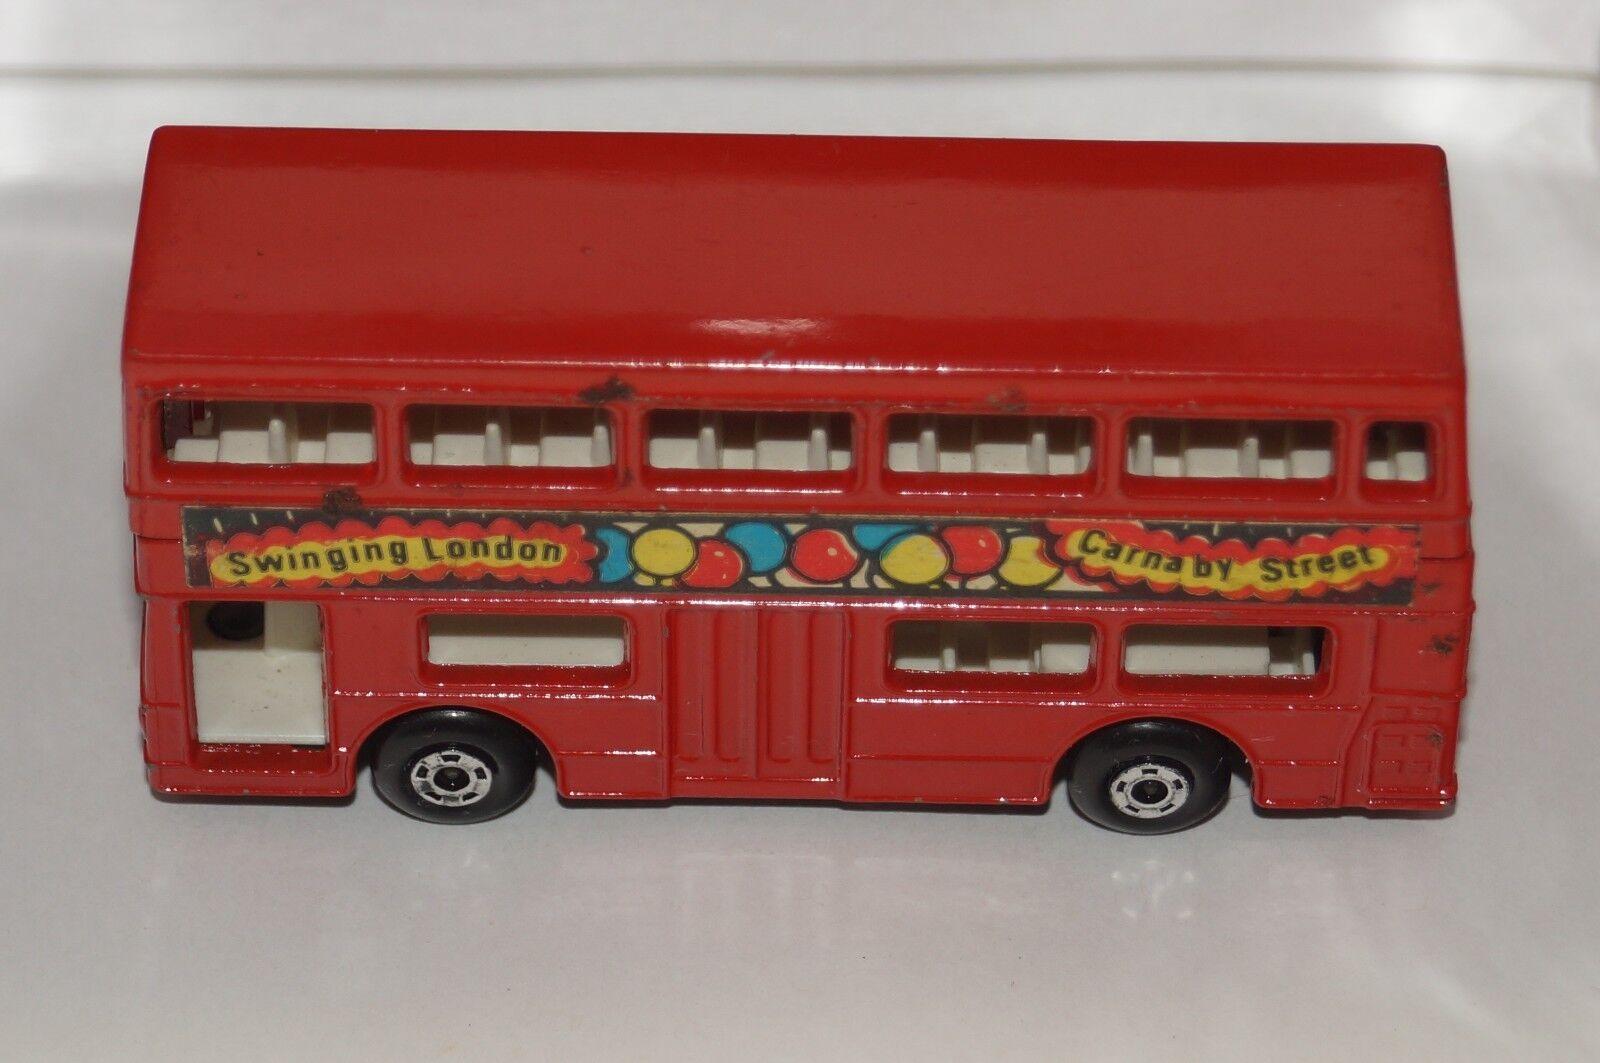 ORIGINAL Matchbox Superfast - The Londoner - - - No 17 - Red color - Swinging London aea615